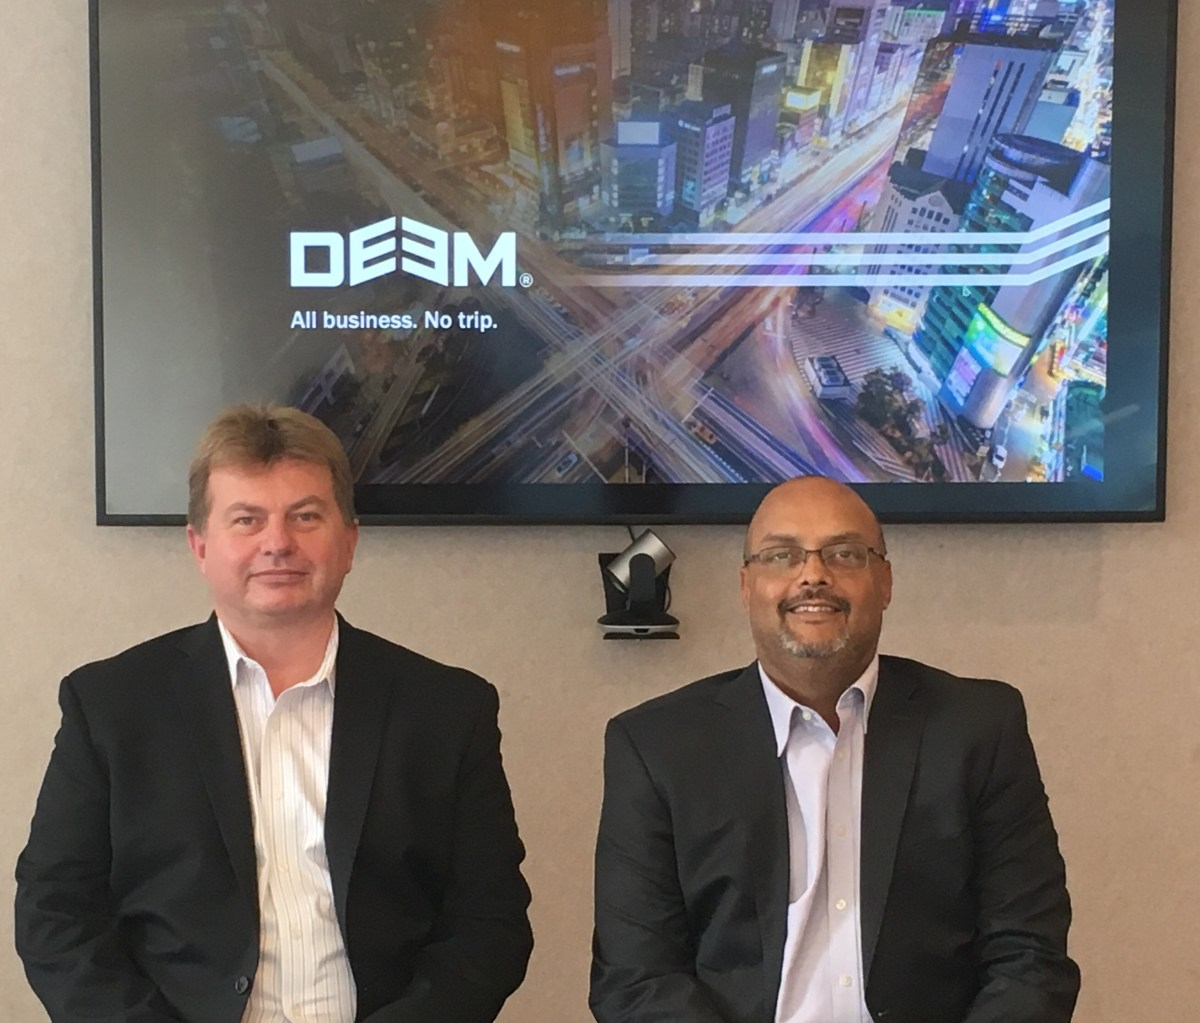 Neil Markey, CIO & SVP Product, Deem and Ramesh Kalanje, VP and GM, Deem